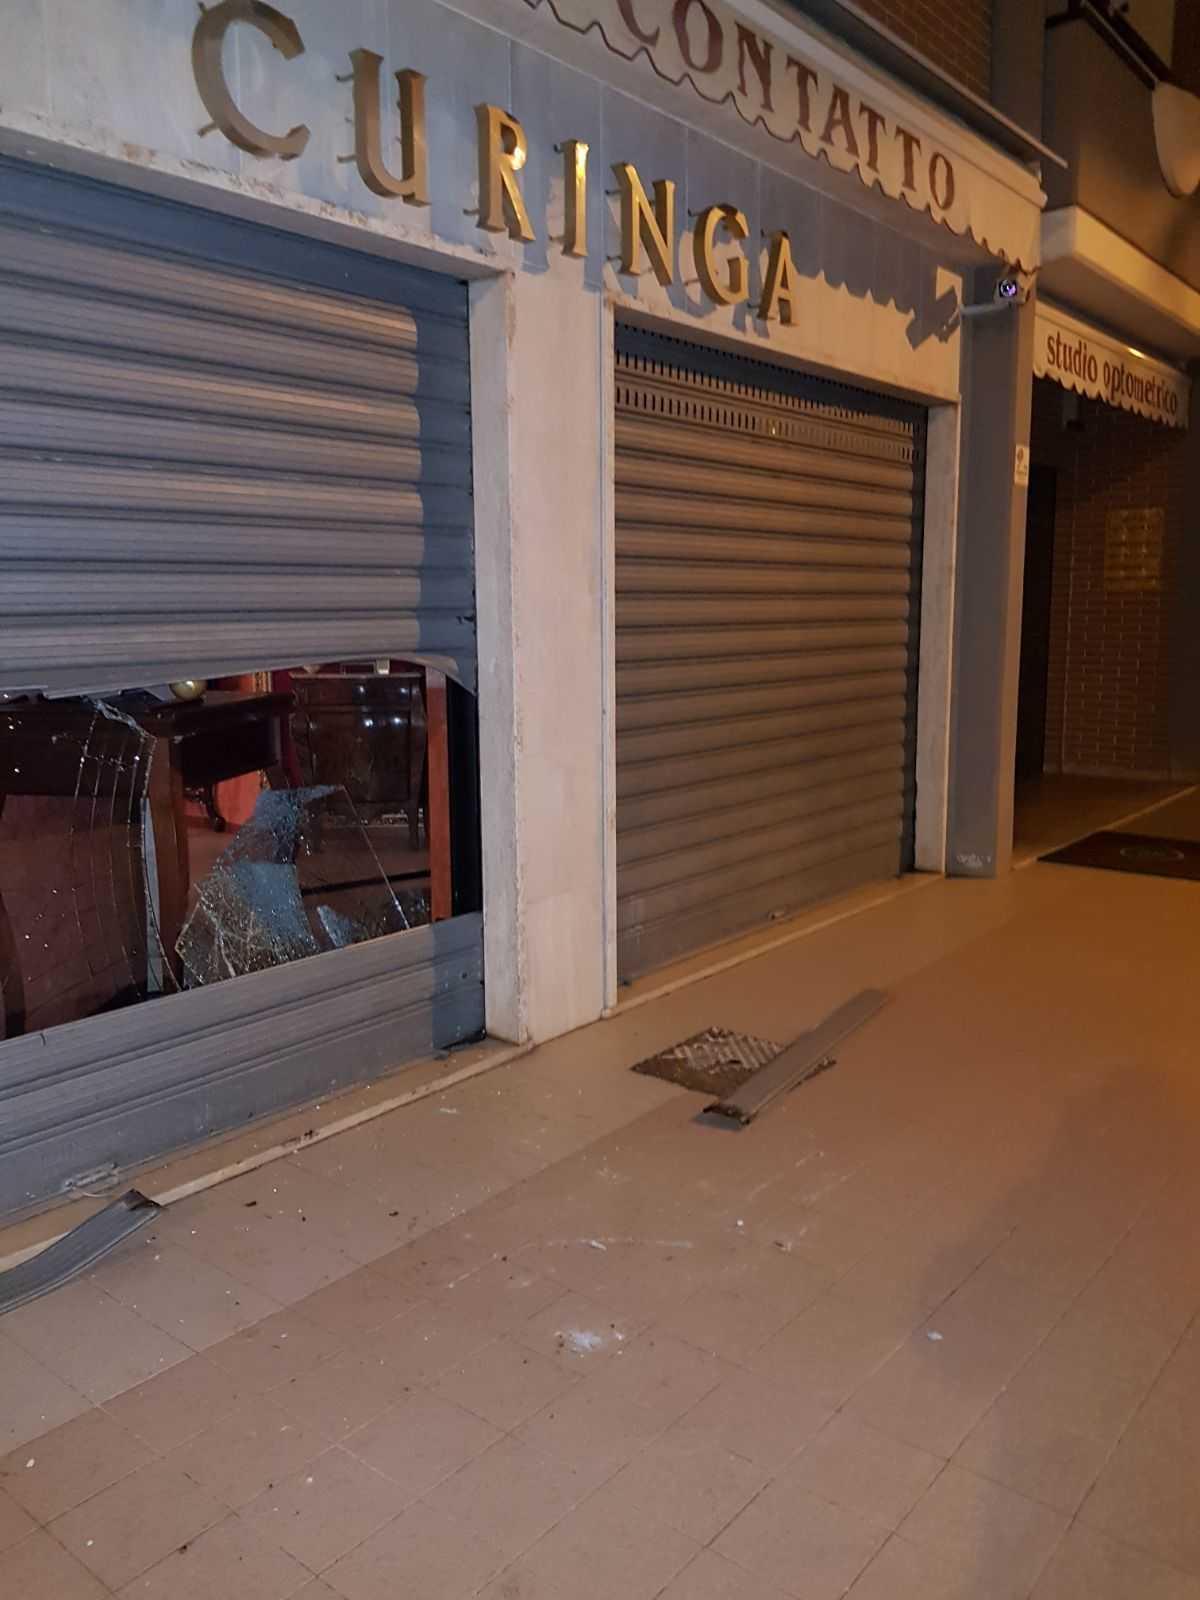 5ab9132298 Furto notturno da Curinga a Latina Scalo, bottino da oltre 30 mila ...